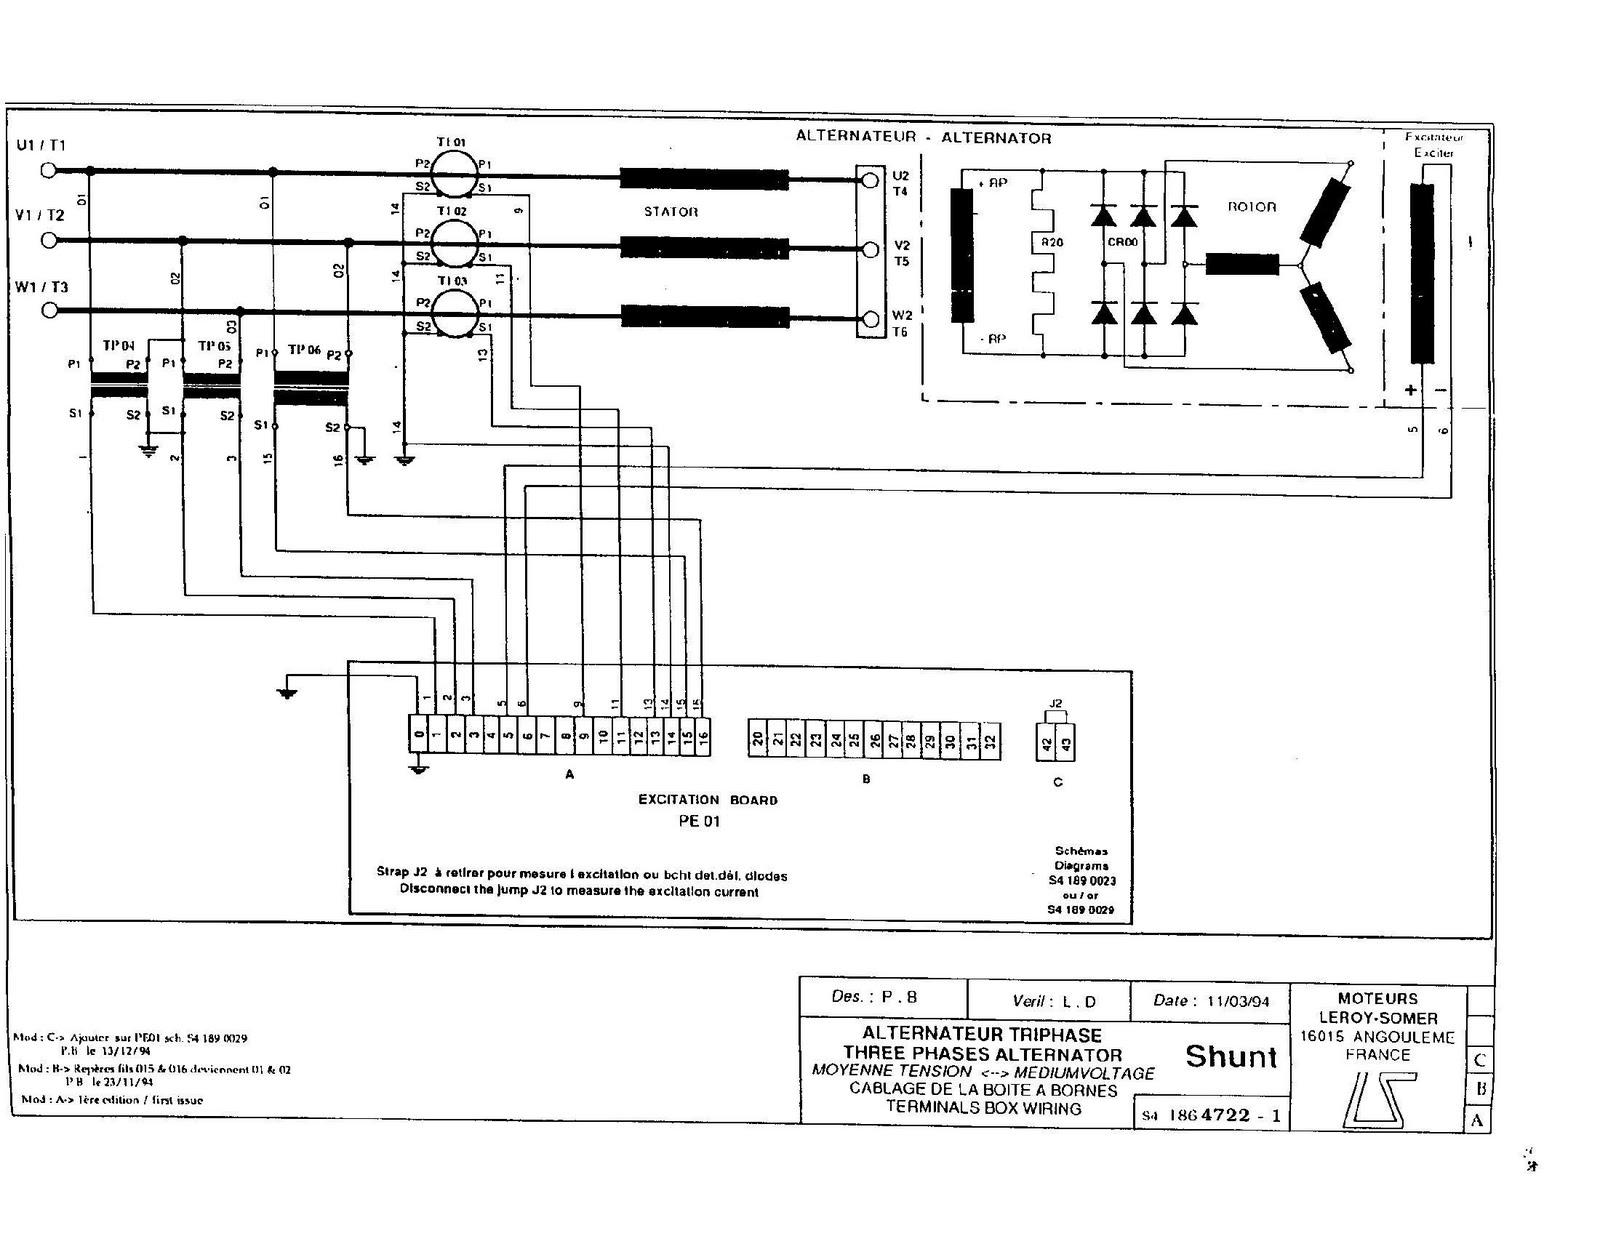 Palle Solar Power Plant Layout Diagram Pictures